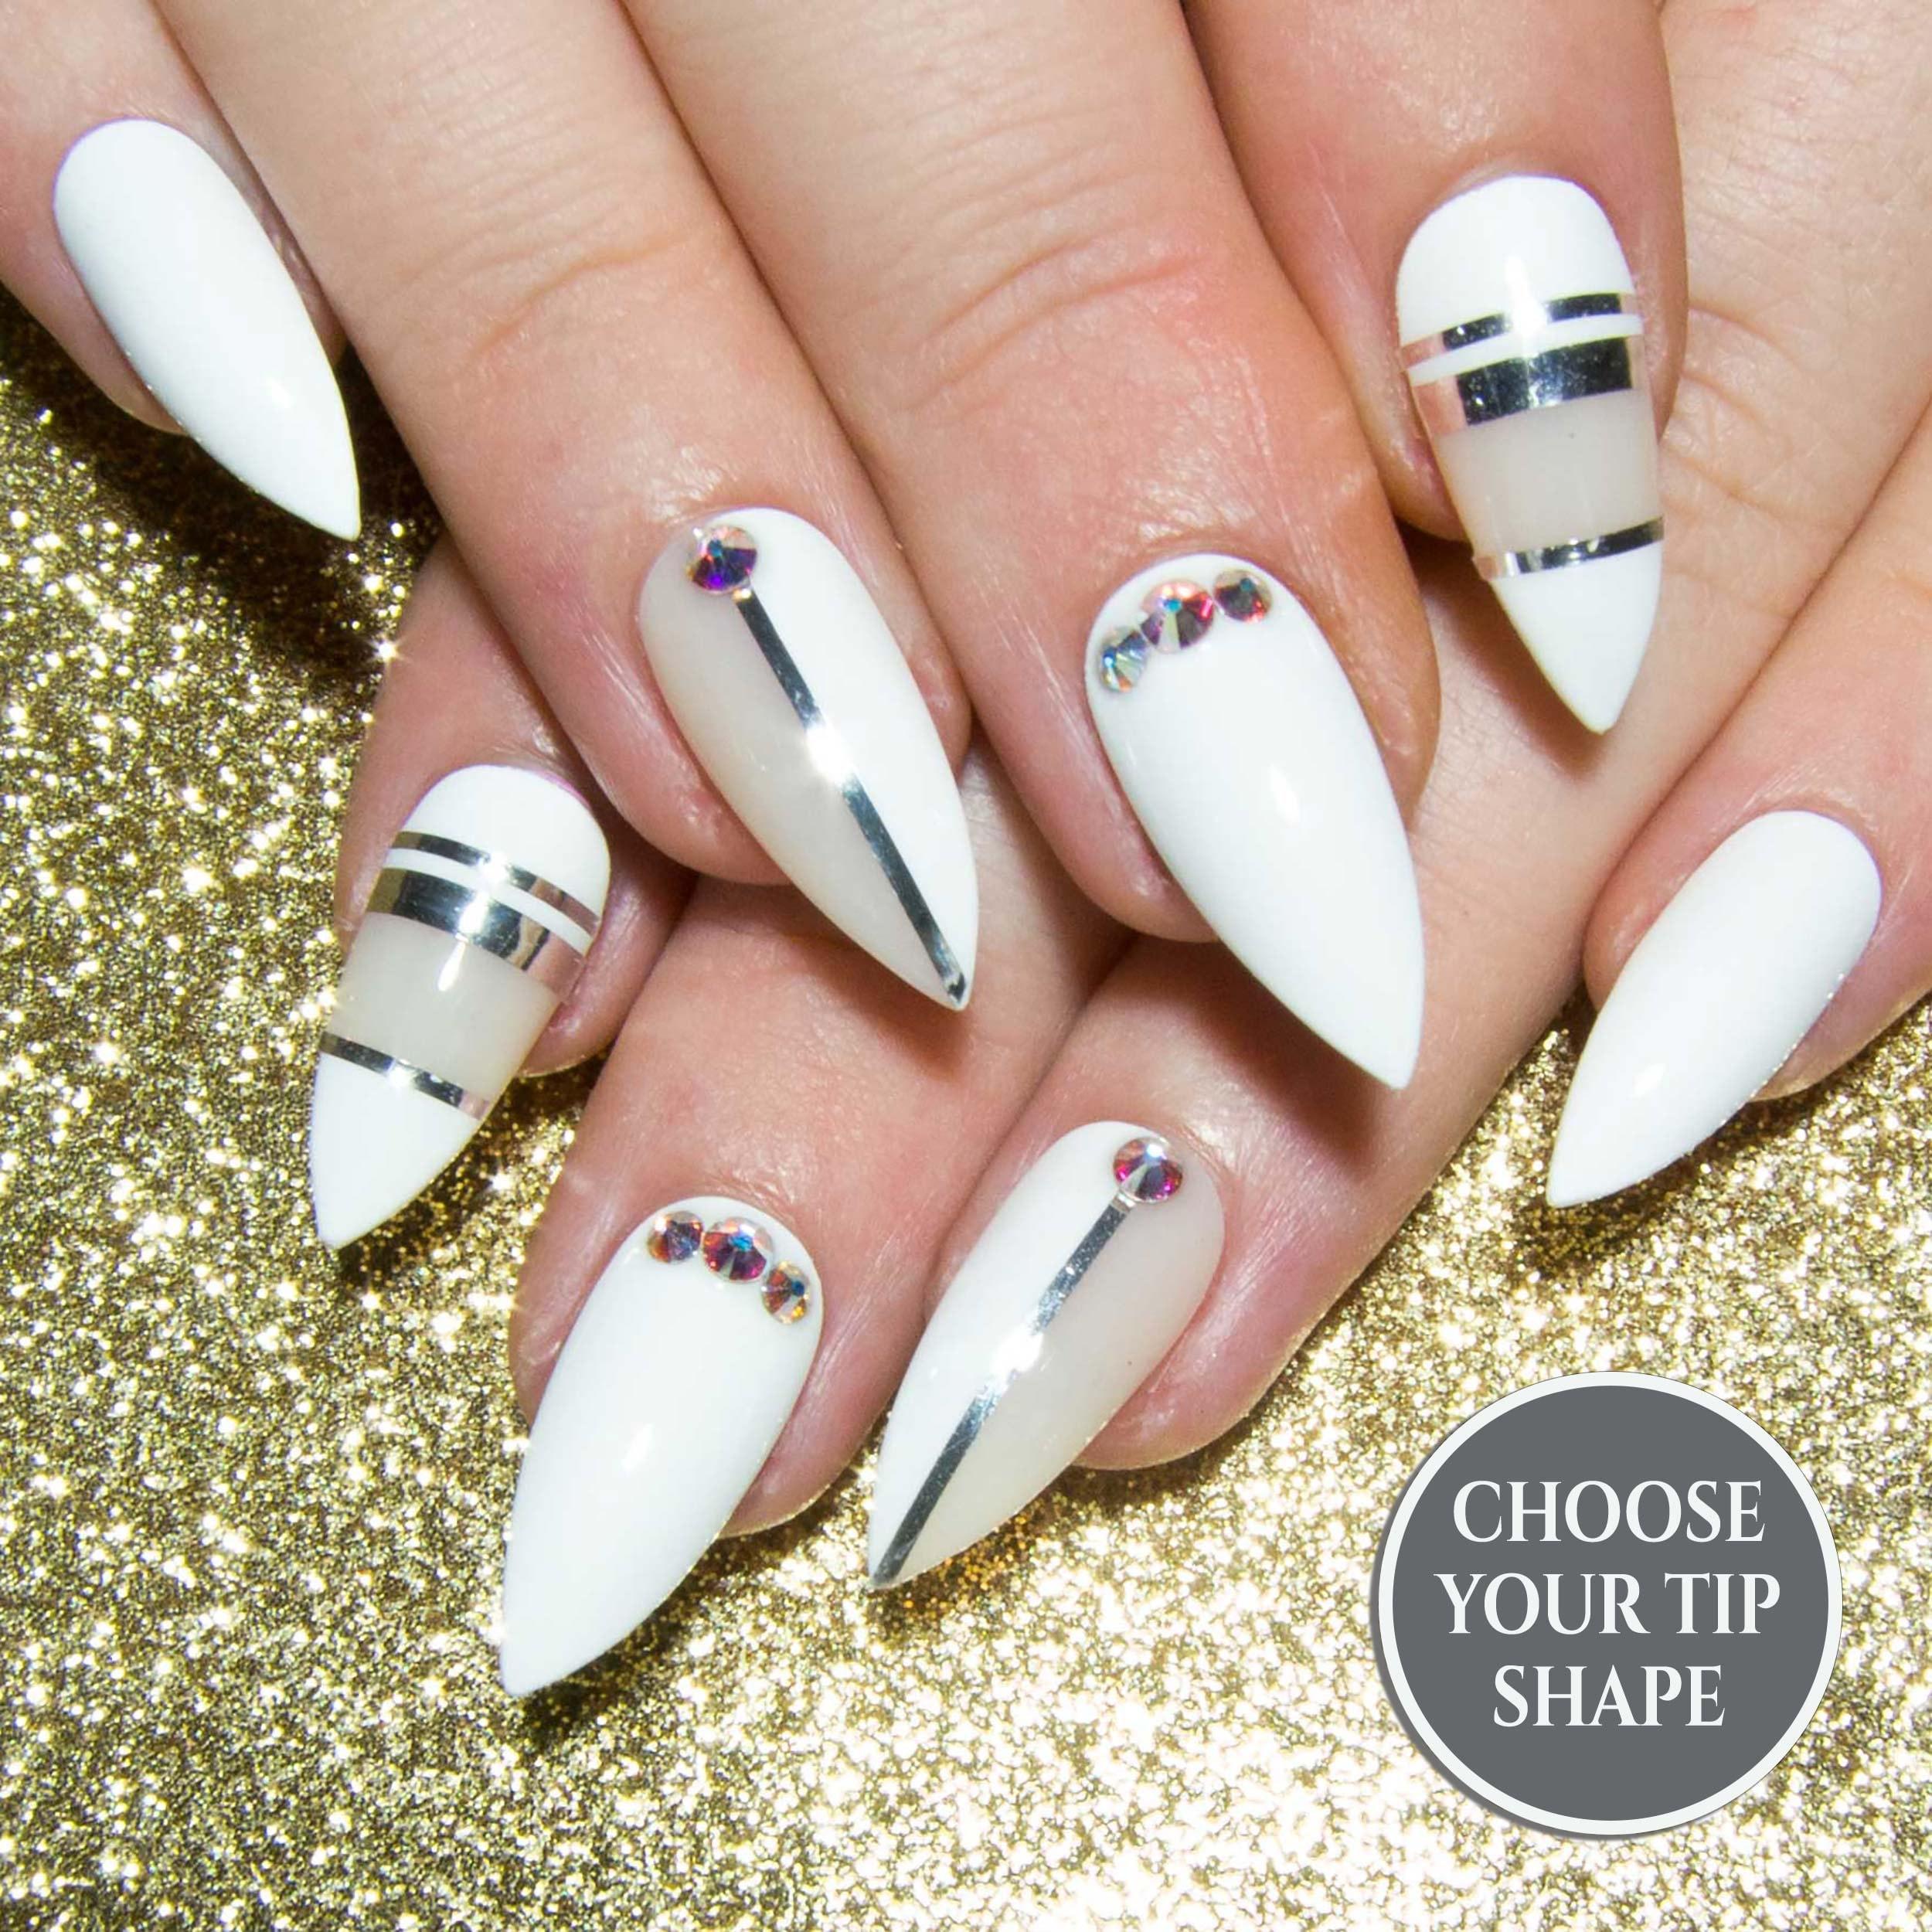 Press On Stiletto Nails - False Nail French - Fake Nails Design - Crystal  Nails - Pointy White Nails - Swarovksi Nails - False Nails UK